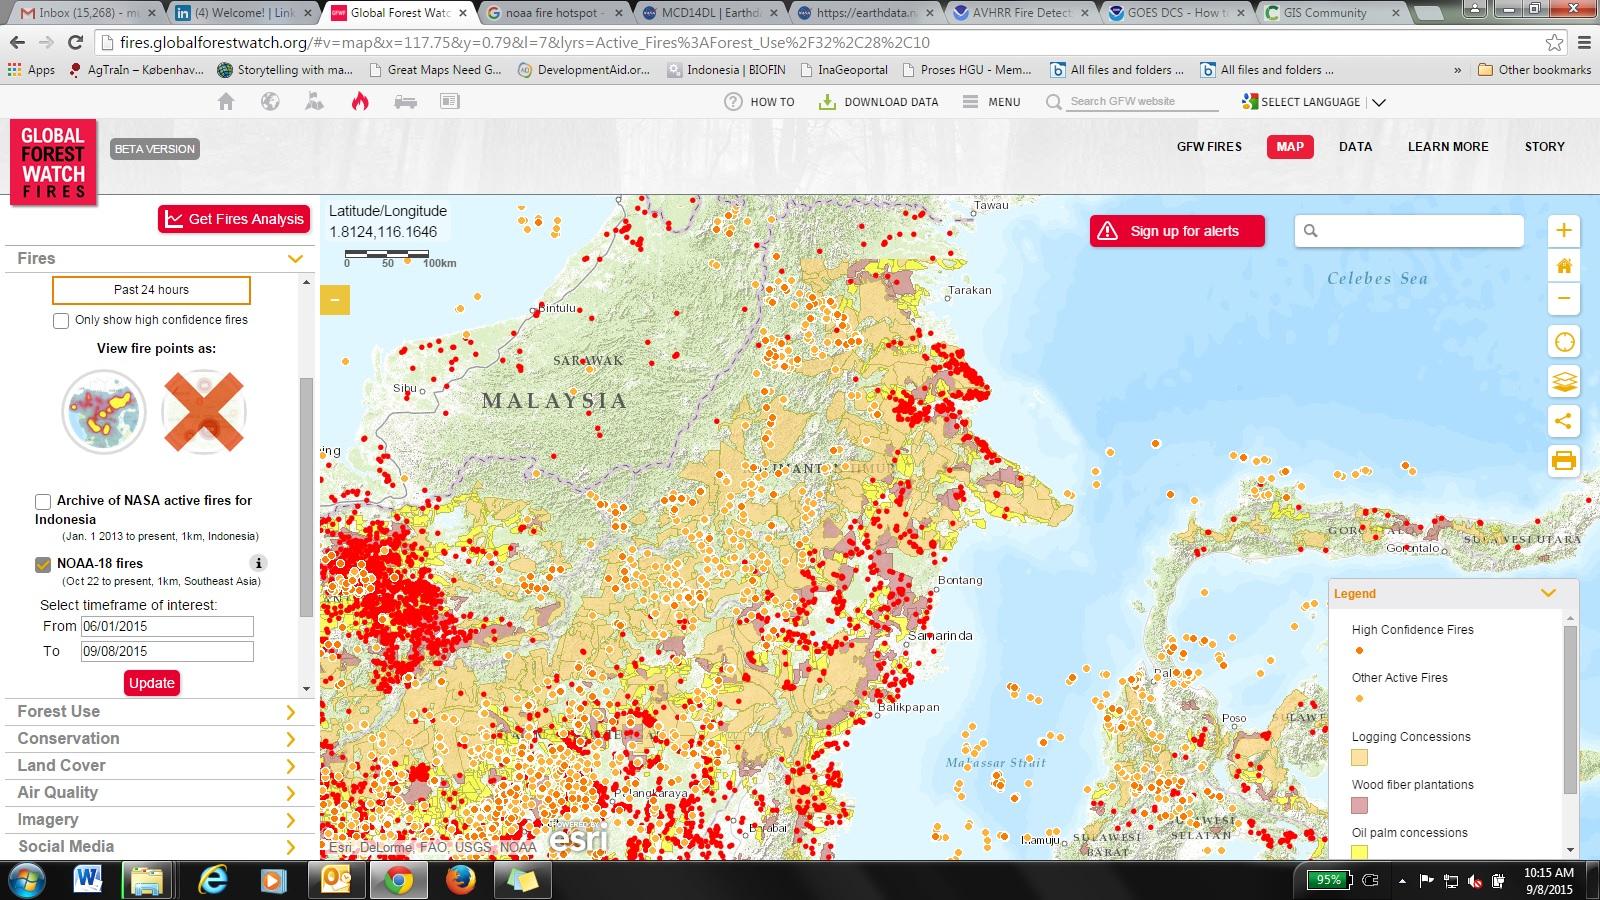 GFW fires_concession map June-Sept 2015_East Kal